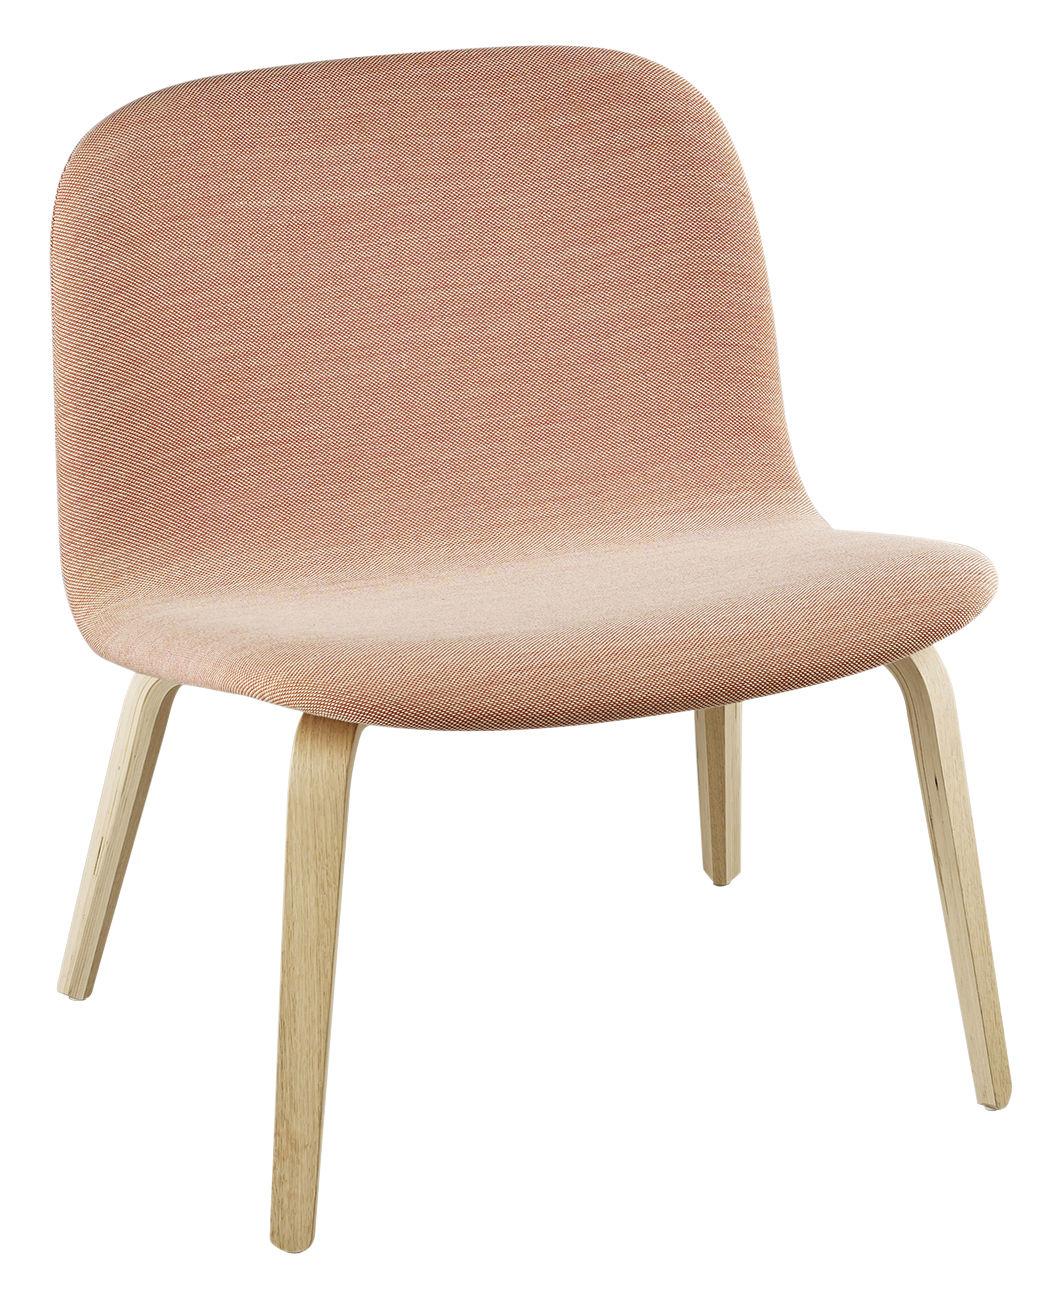 Furniture - Armchairs - Visu Low armchair - Version Tissu - Assise : H 35 cm by Muuto - Wood / Pink fabric - Kvadrat fabric, Painted wood